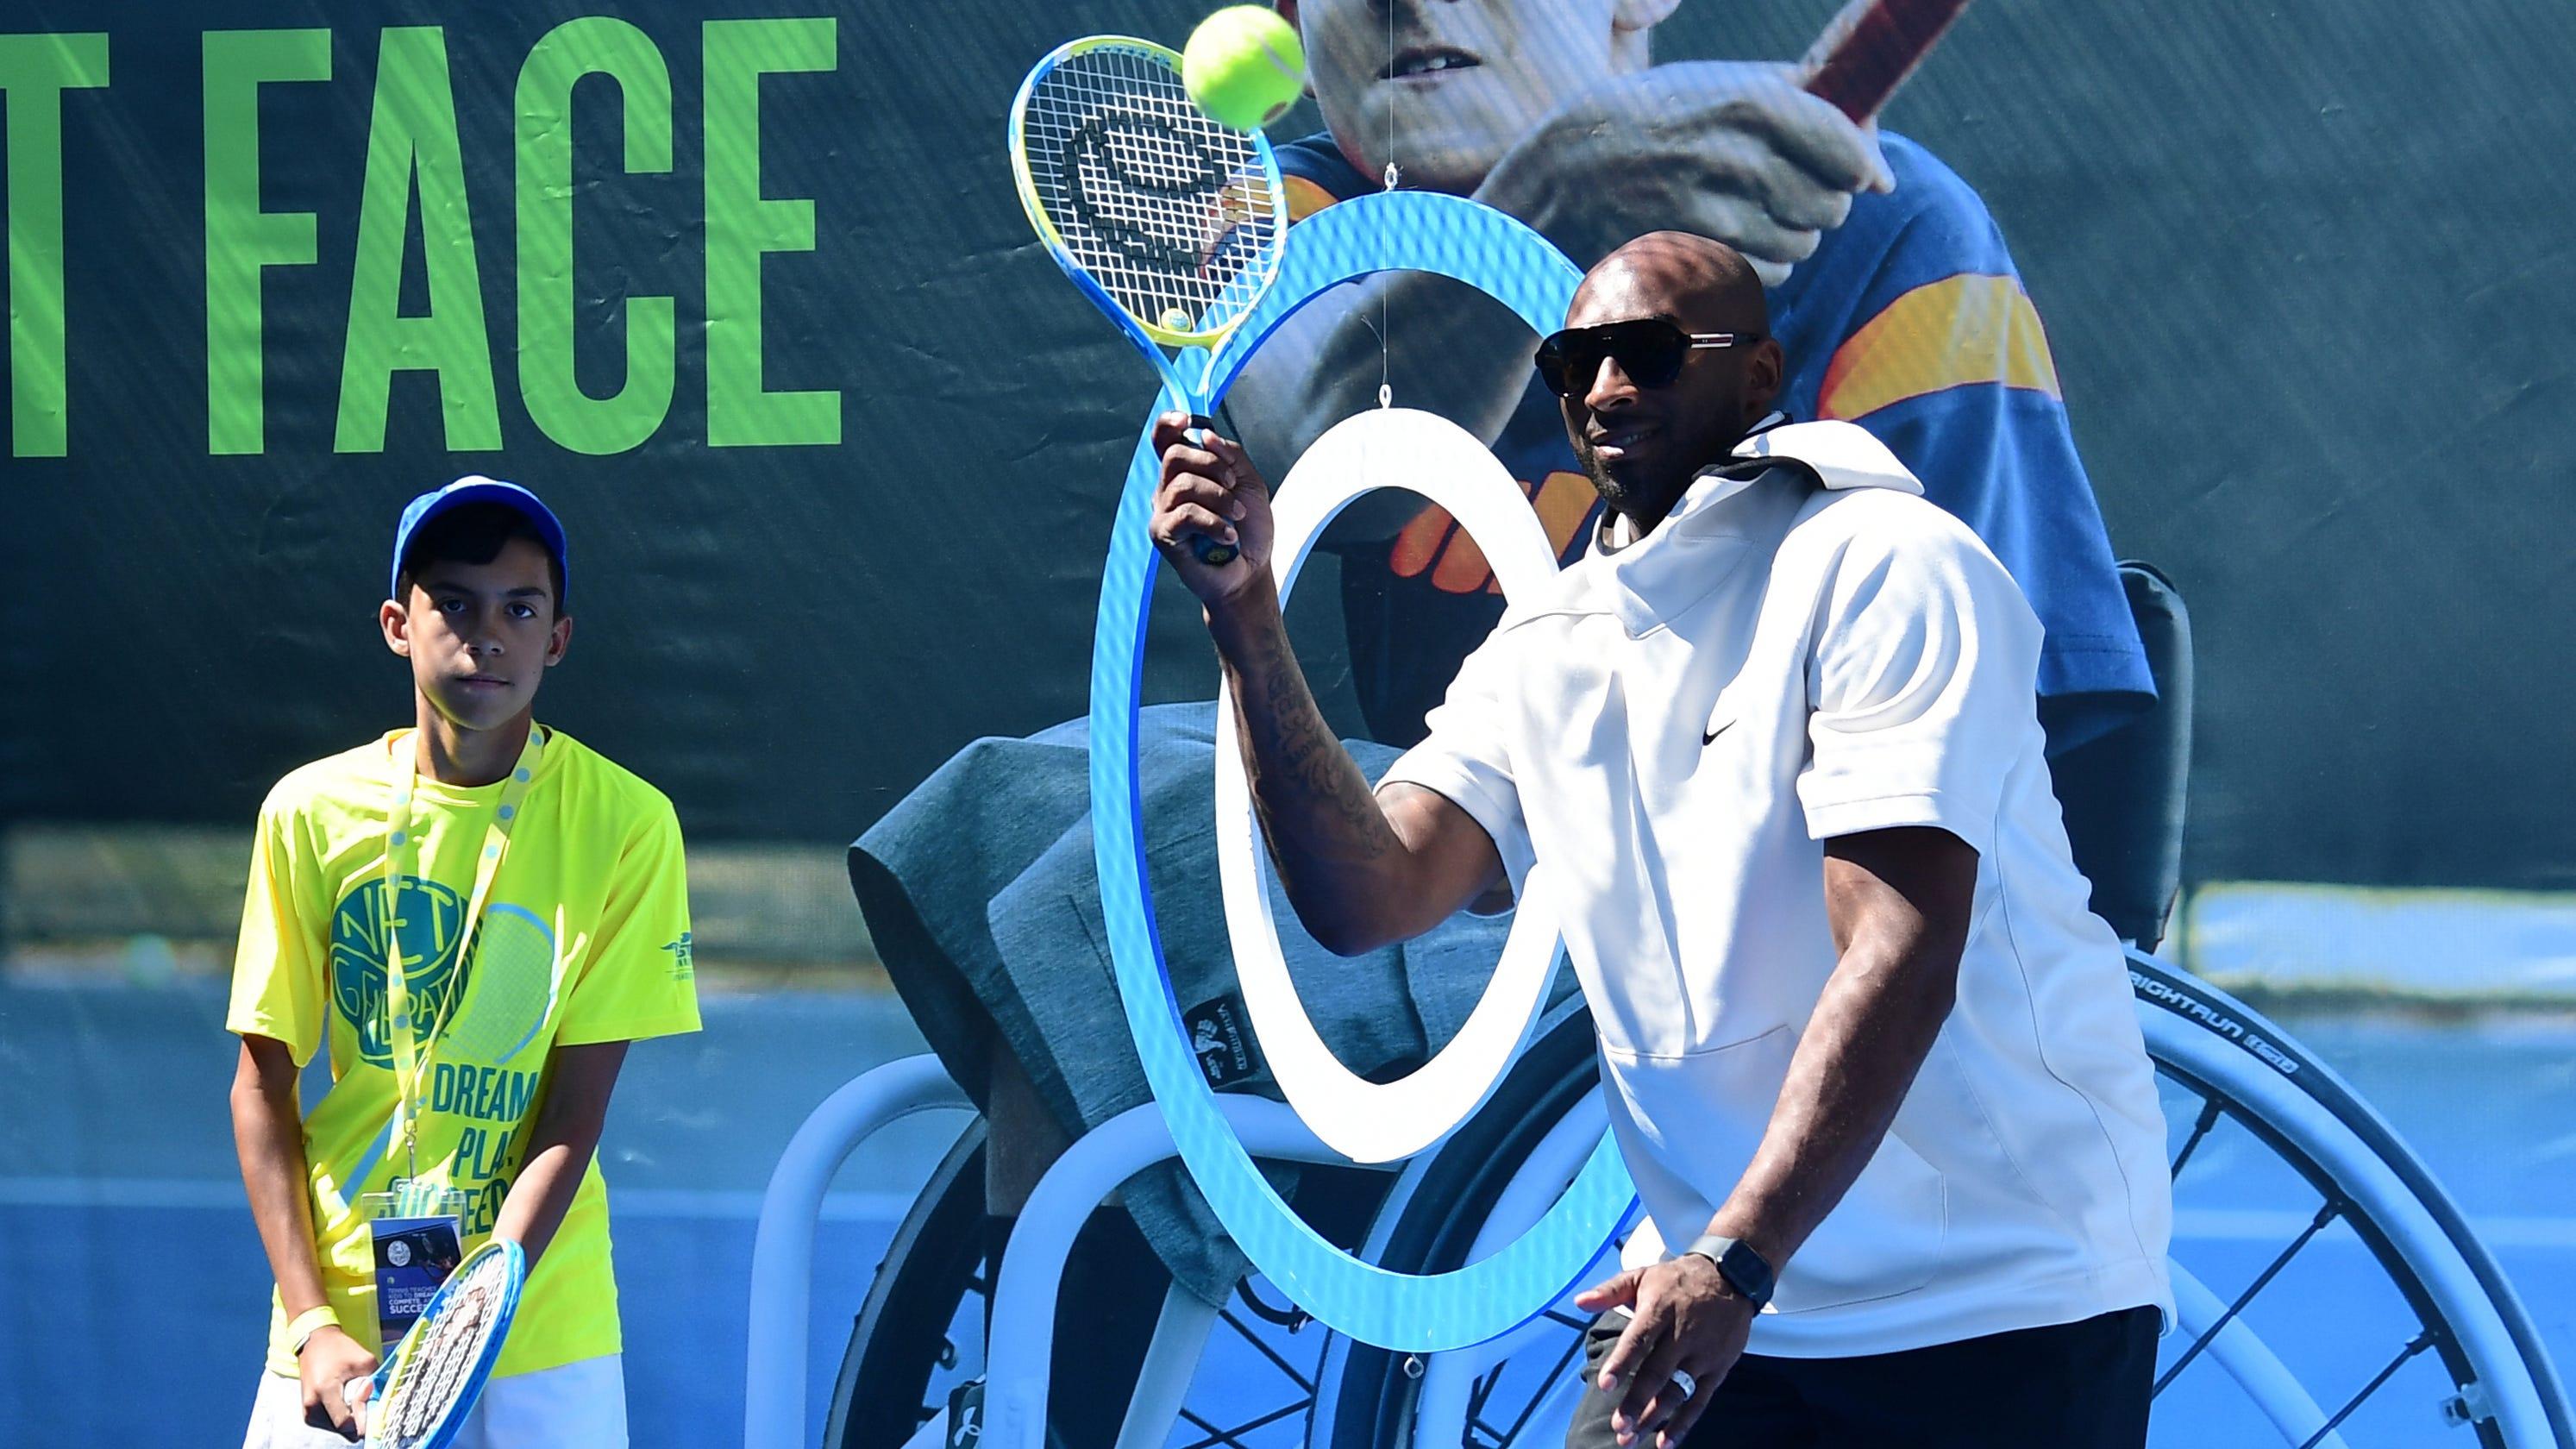 2019 US Open: Kobe Bryant Says Coco 'phenomenon', Shaq